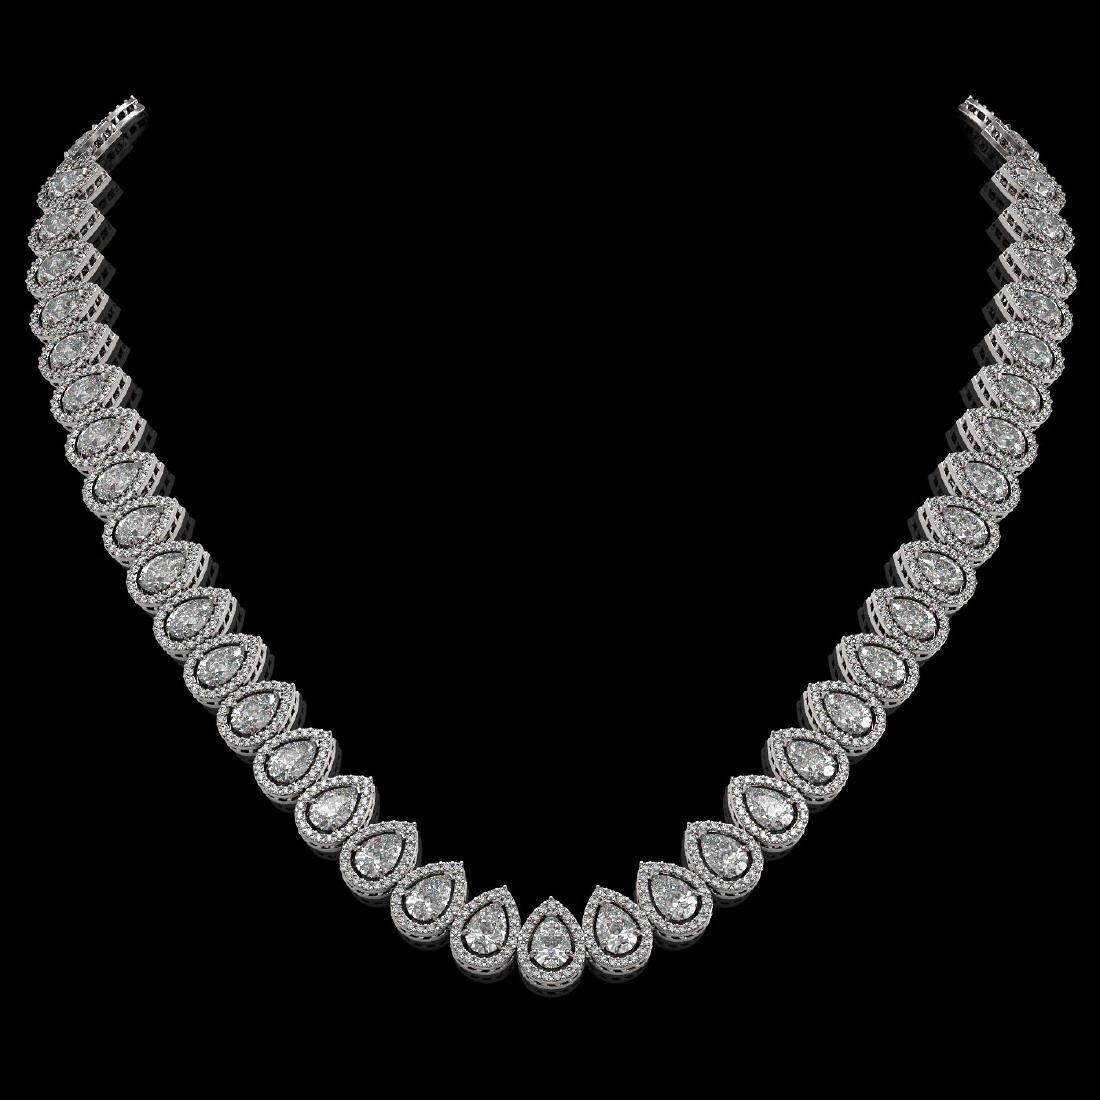 34.83 CTW Pear Diamond Designer Necklace 18K White Gold